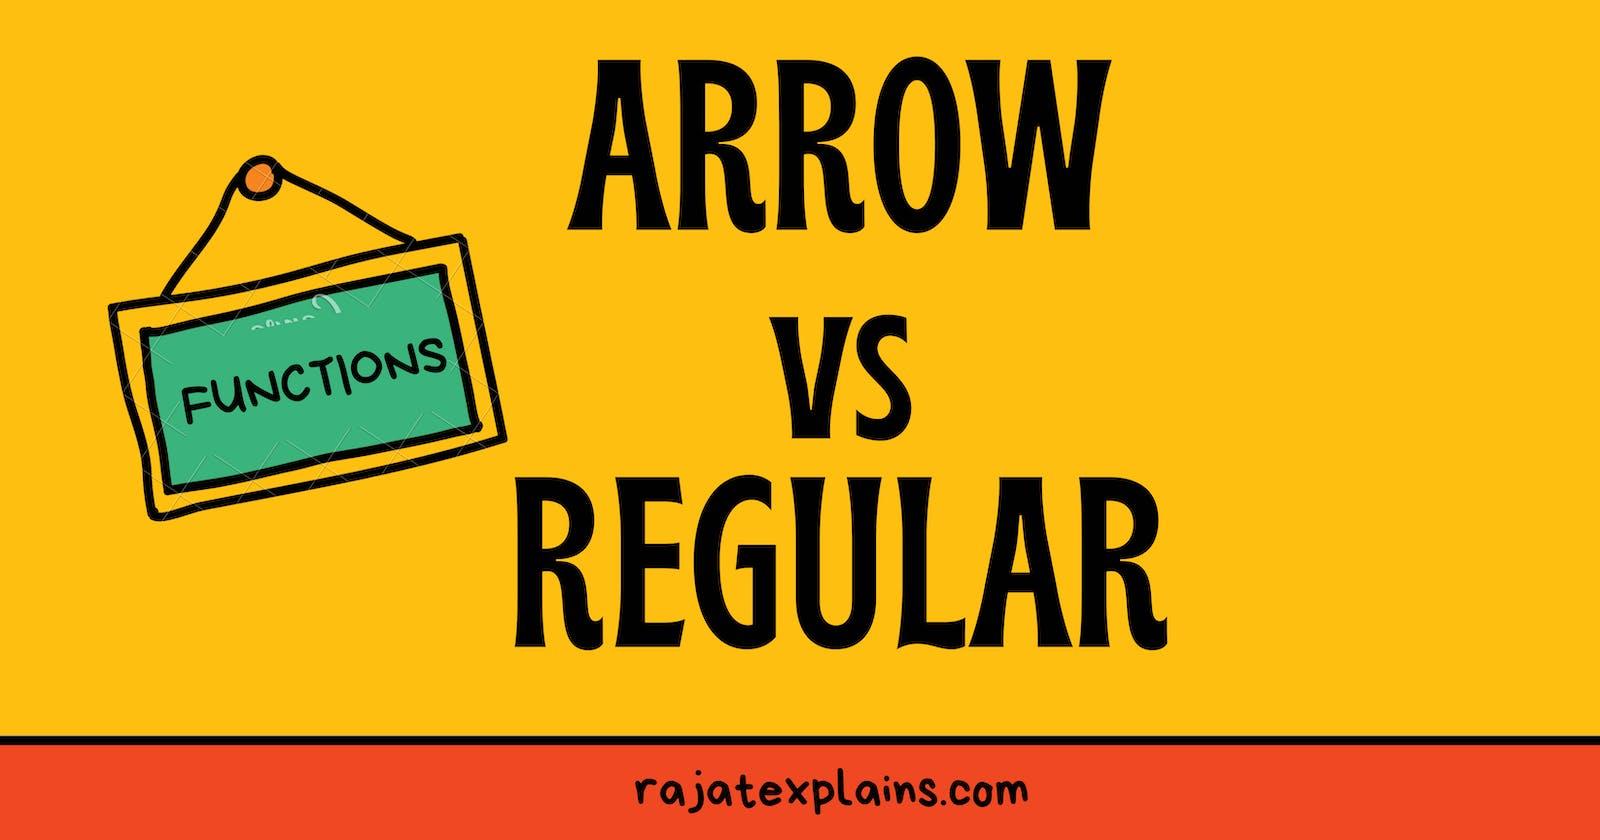 Arrow vs Regular functions